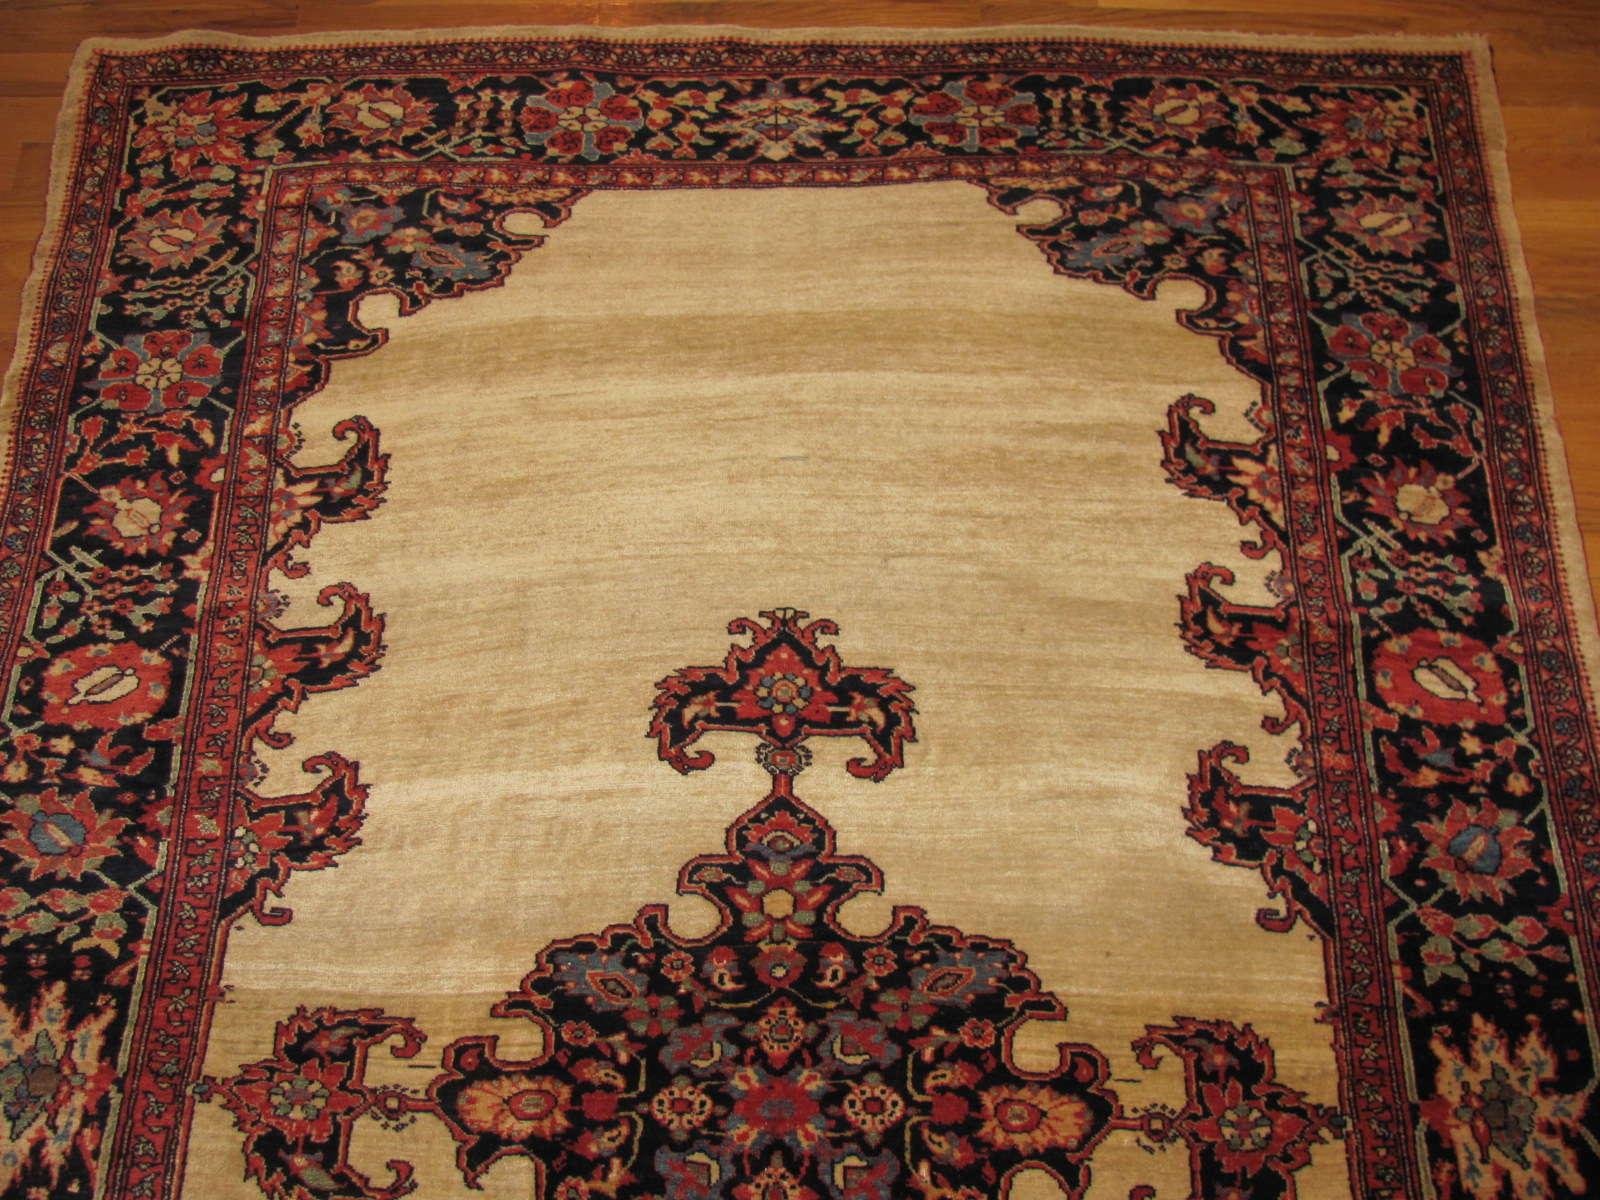 24837 antique persian sarouk fereghan rug 4,7x7,1-1